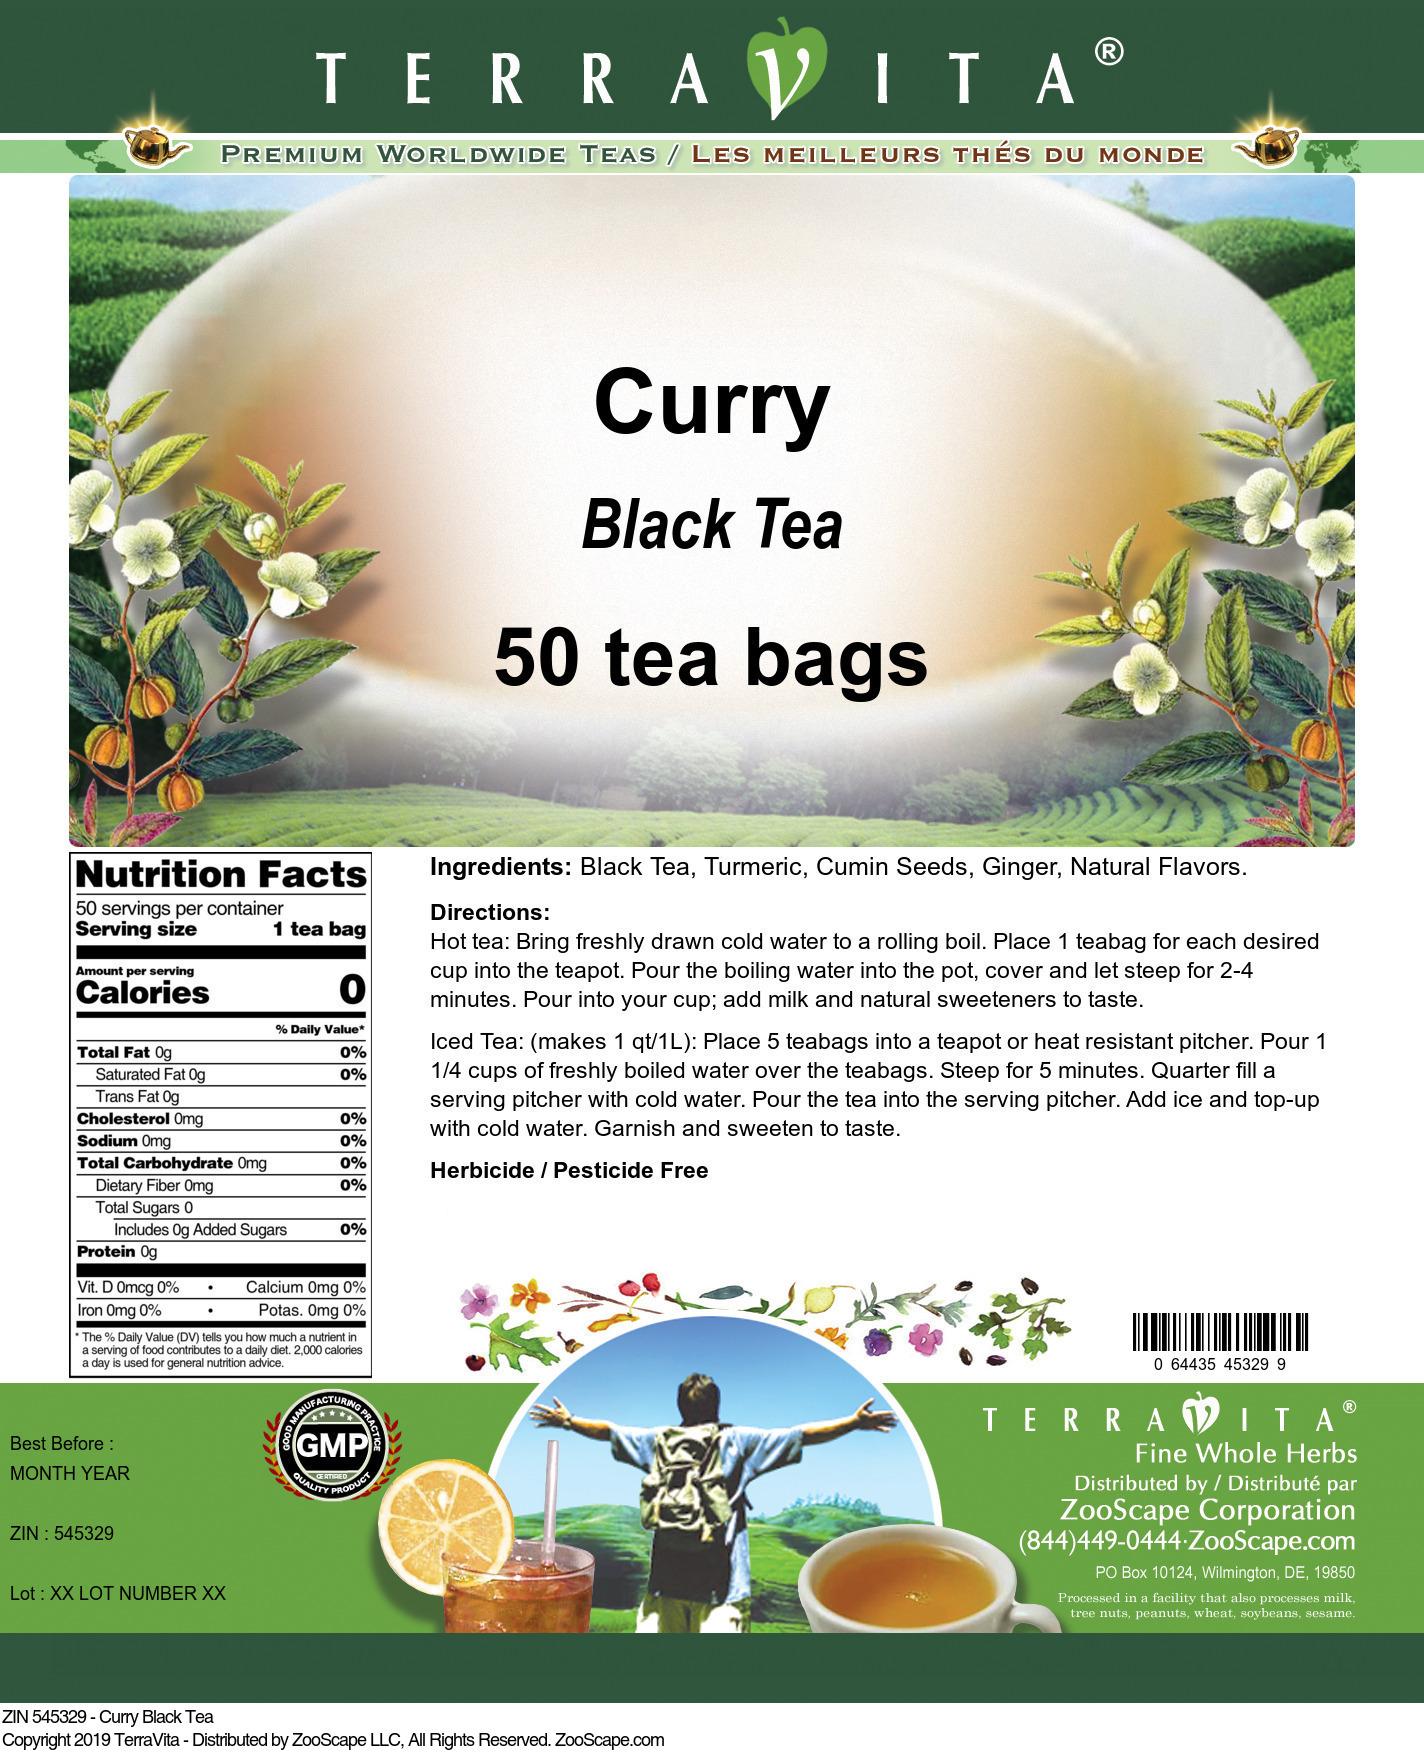 Curry Black Tea